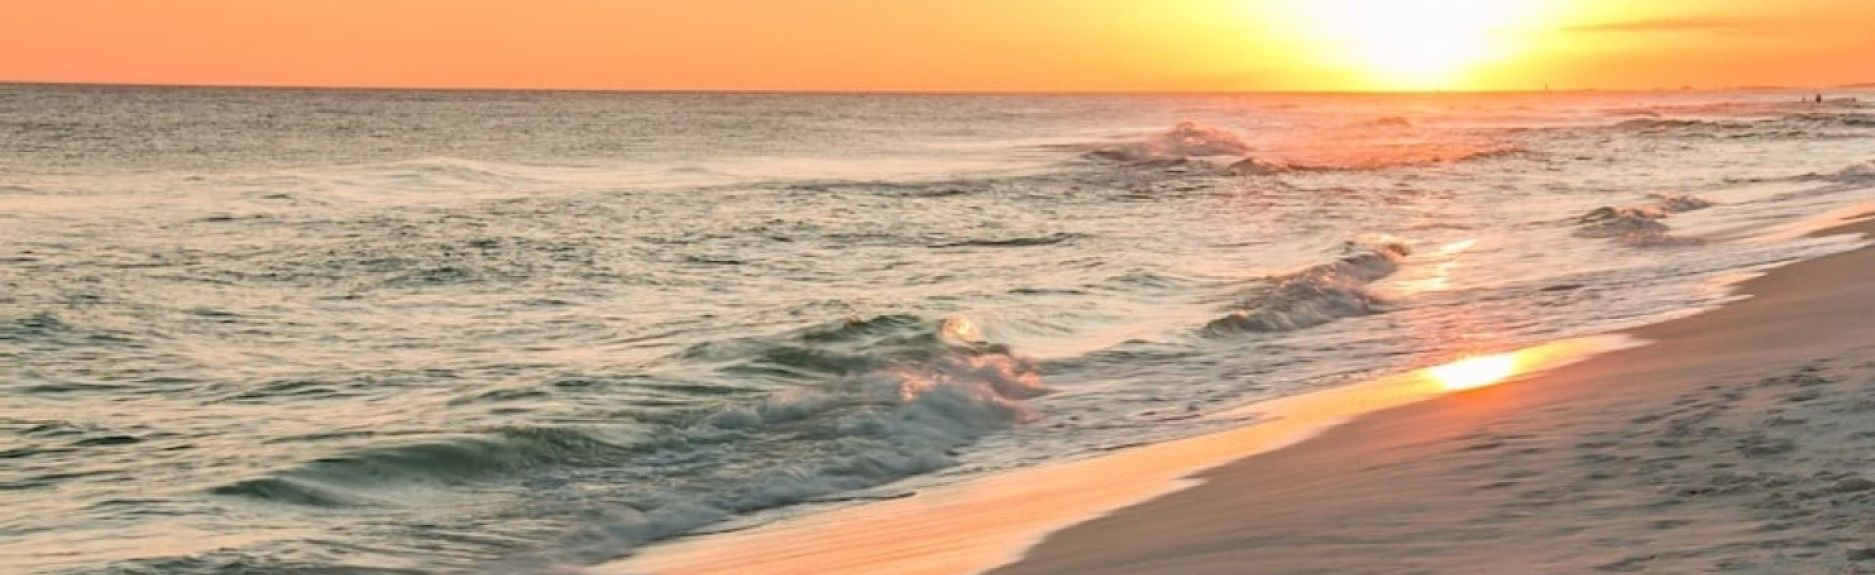 Paradise Retreat (Miramar Beach, Flórida, Estados Unidos)